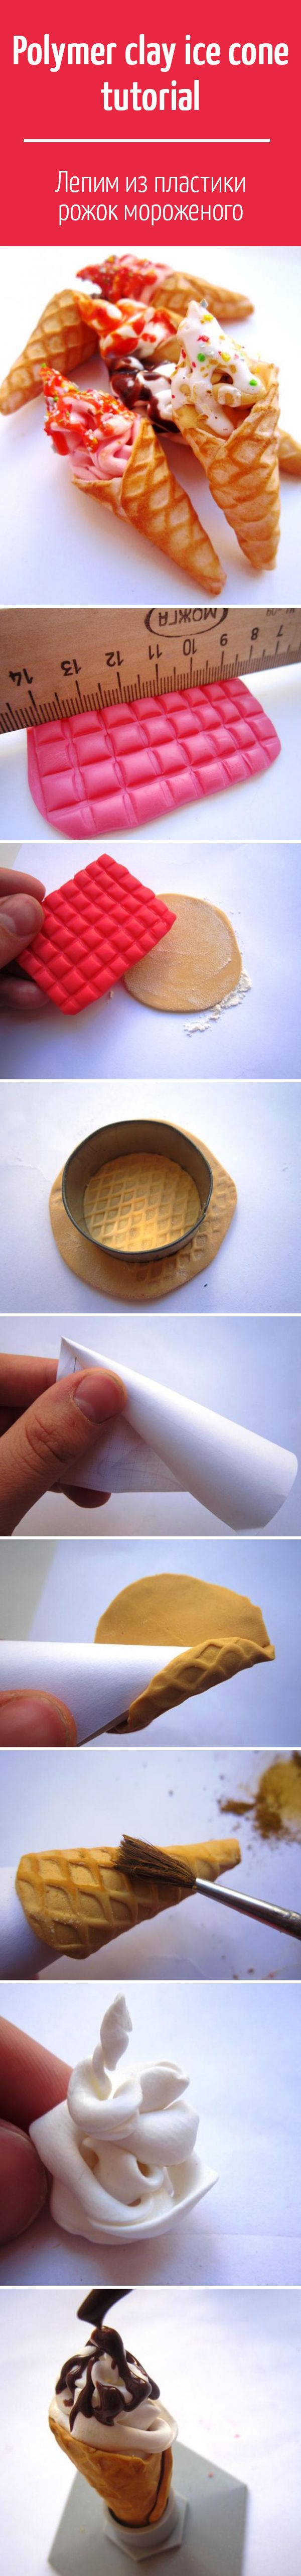 Polymer clay ice cone tutorial / Лепим из пластики рожок мороженого